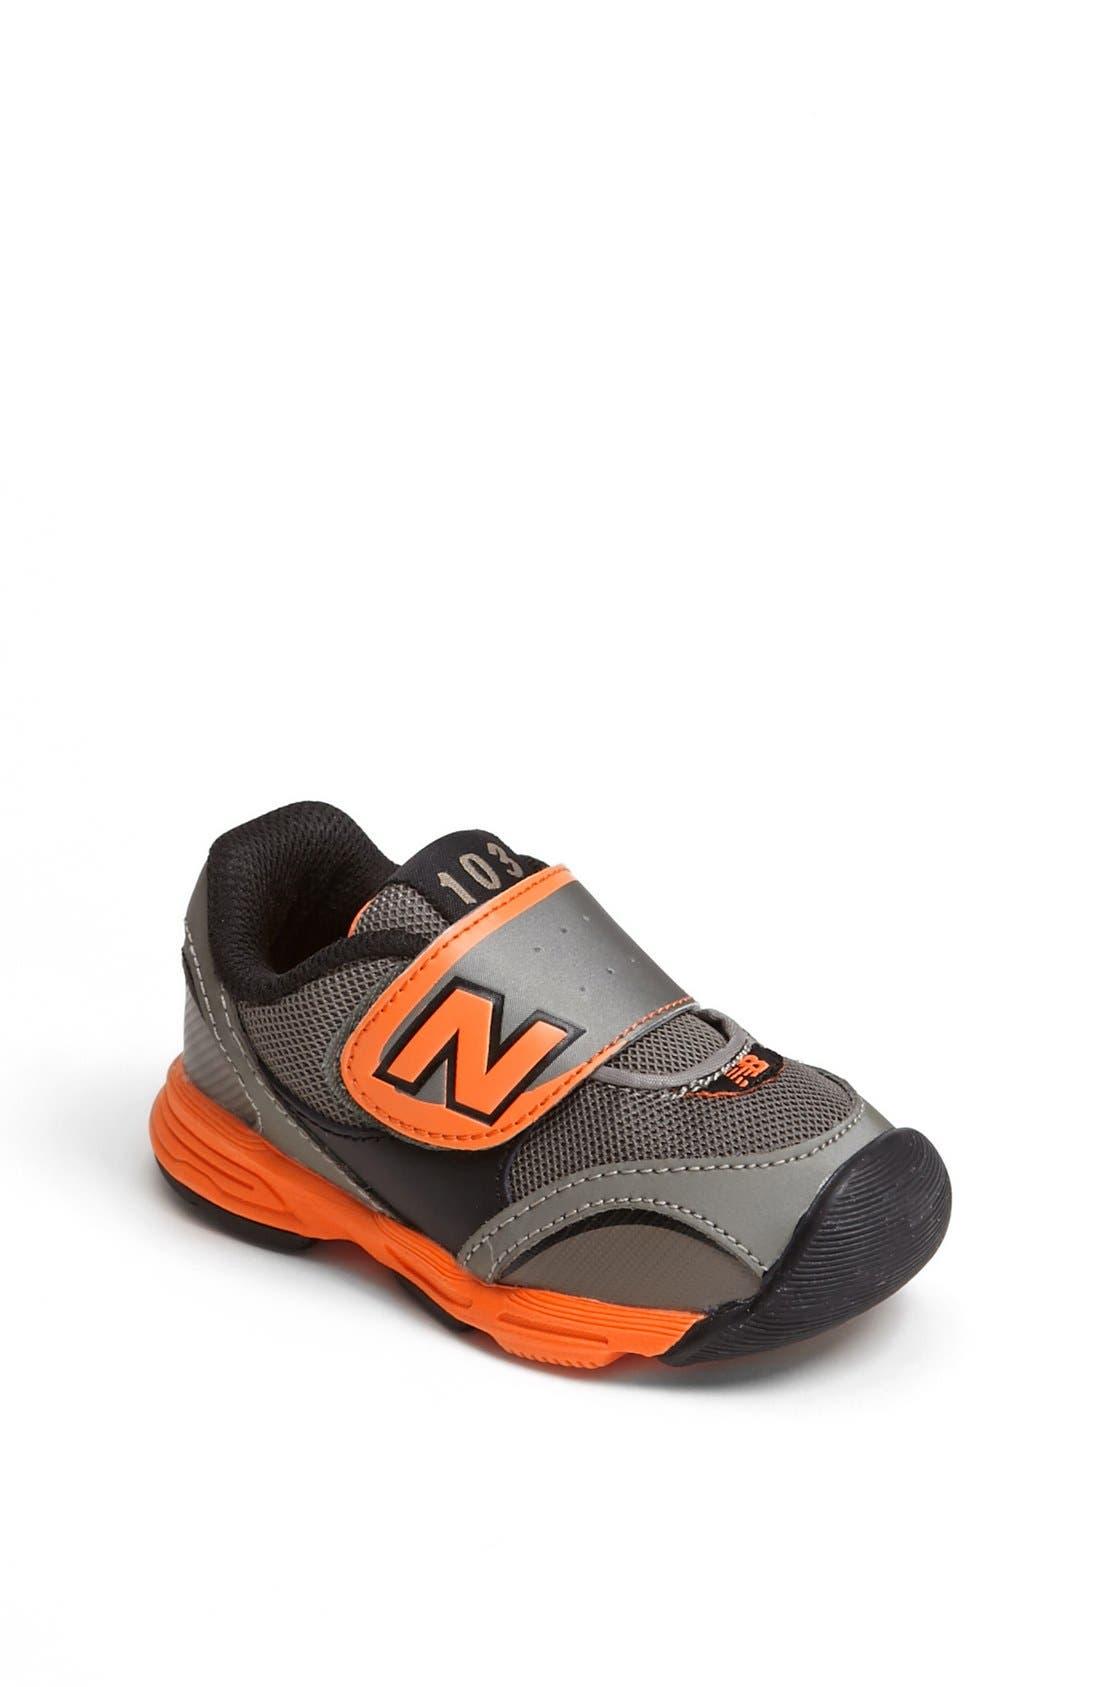 Main Image - New Balance '103' Athletic Shoe (Baby, Walker & Toddler)